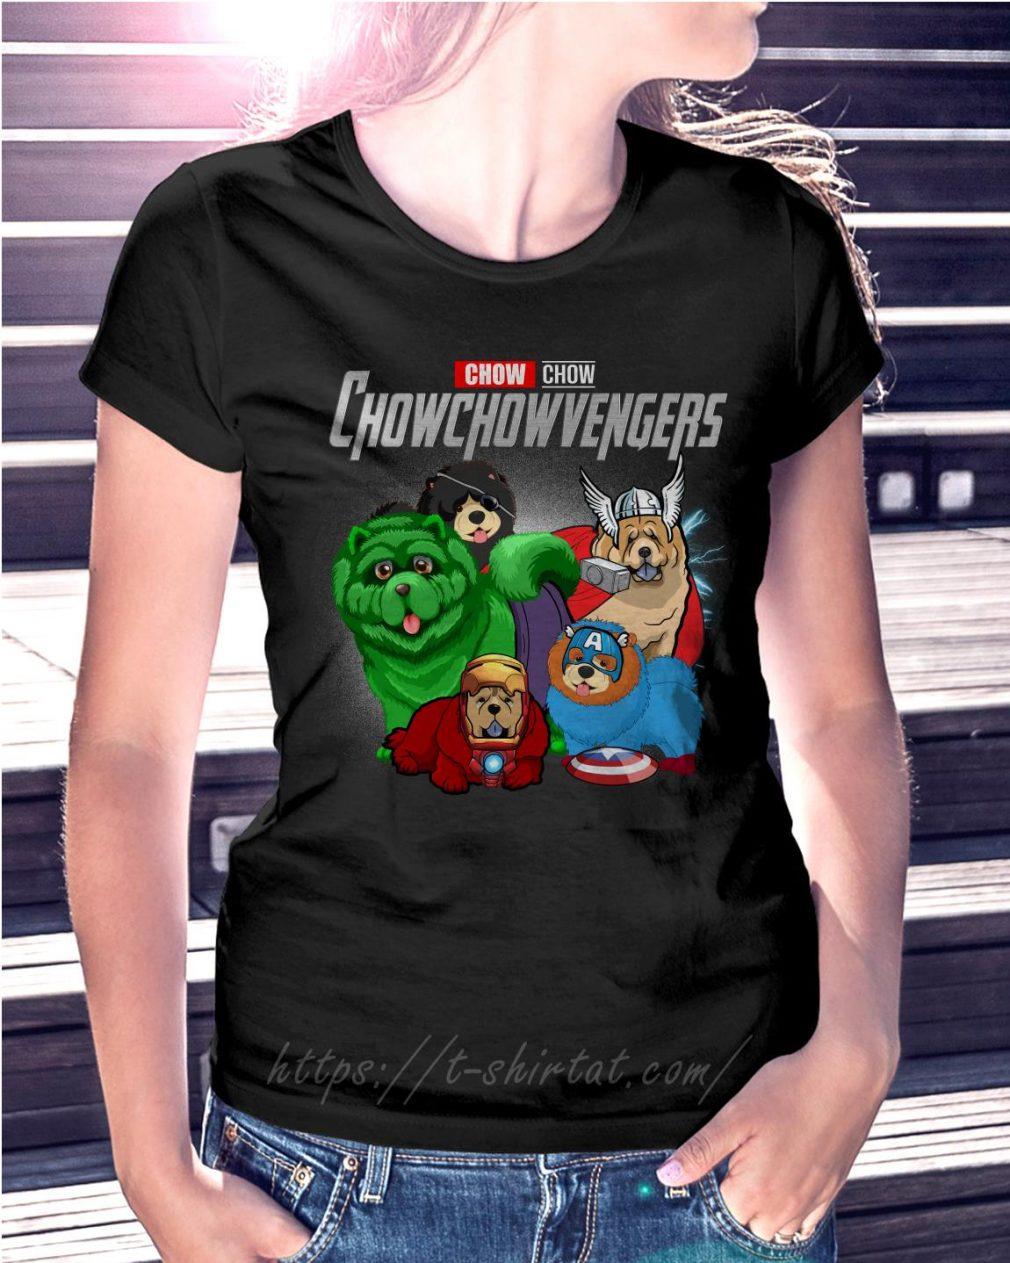 Marvel Chow Chow Chowchowvengers